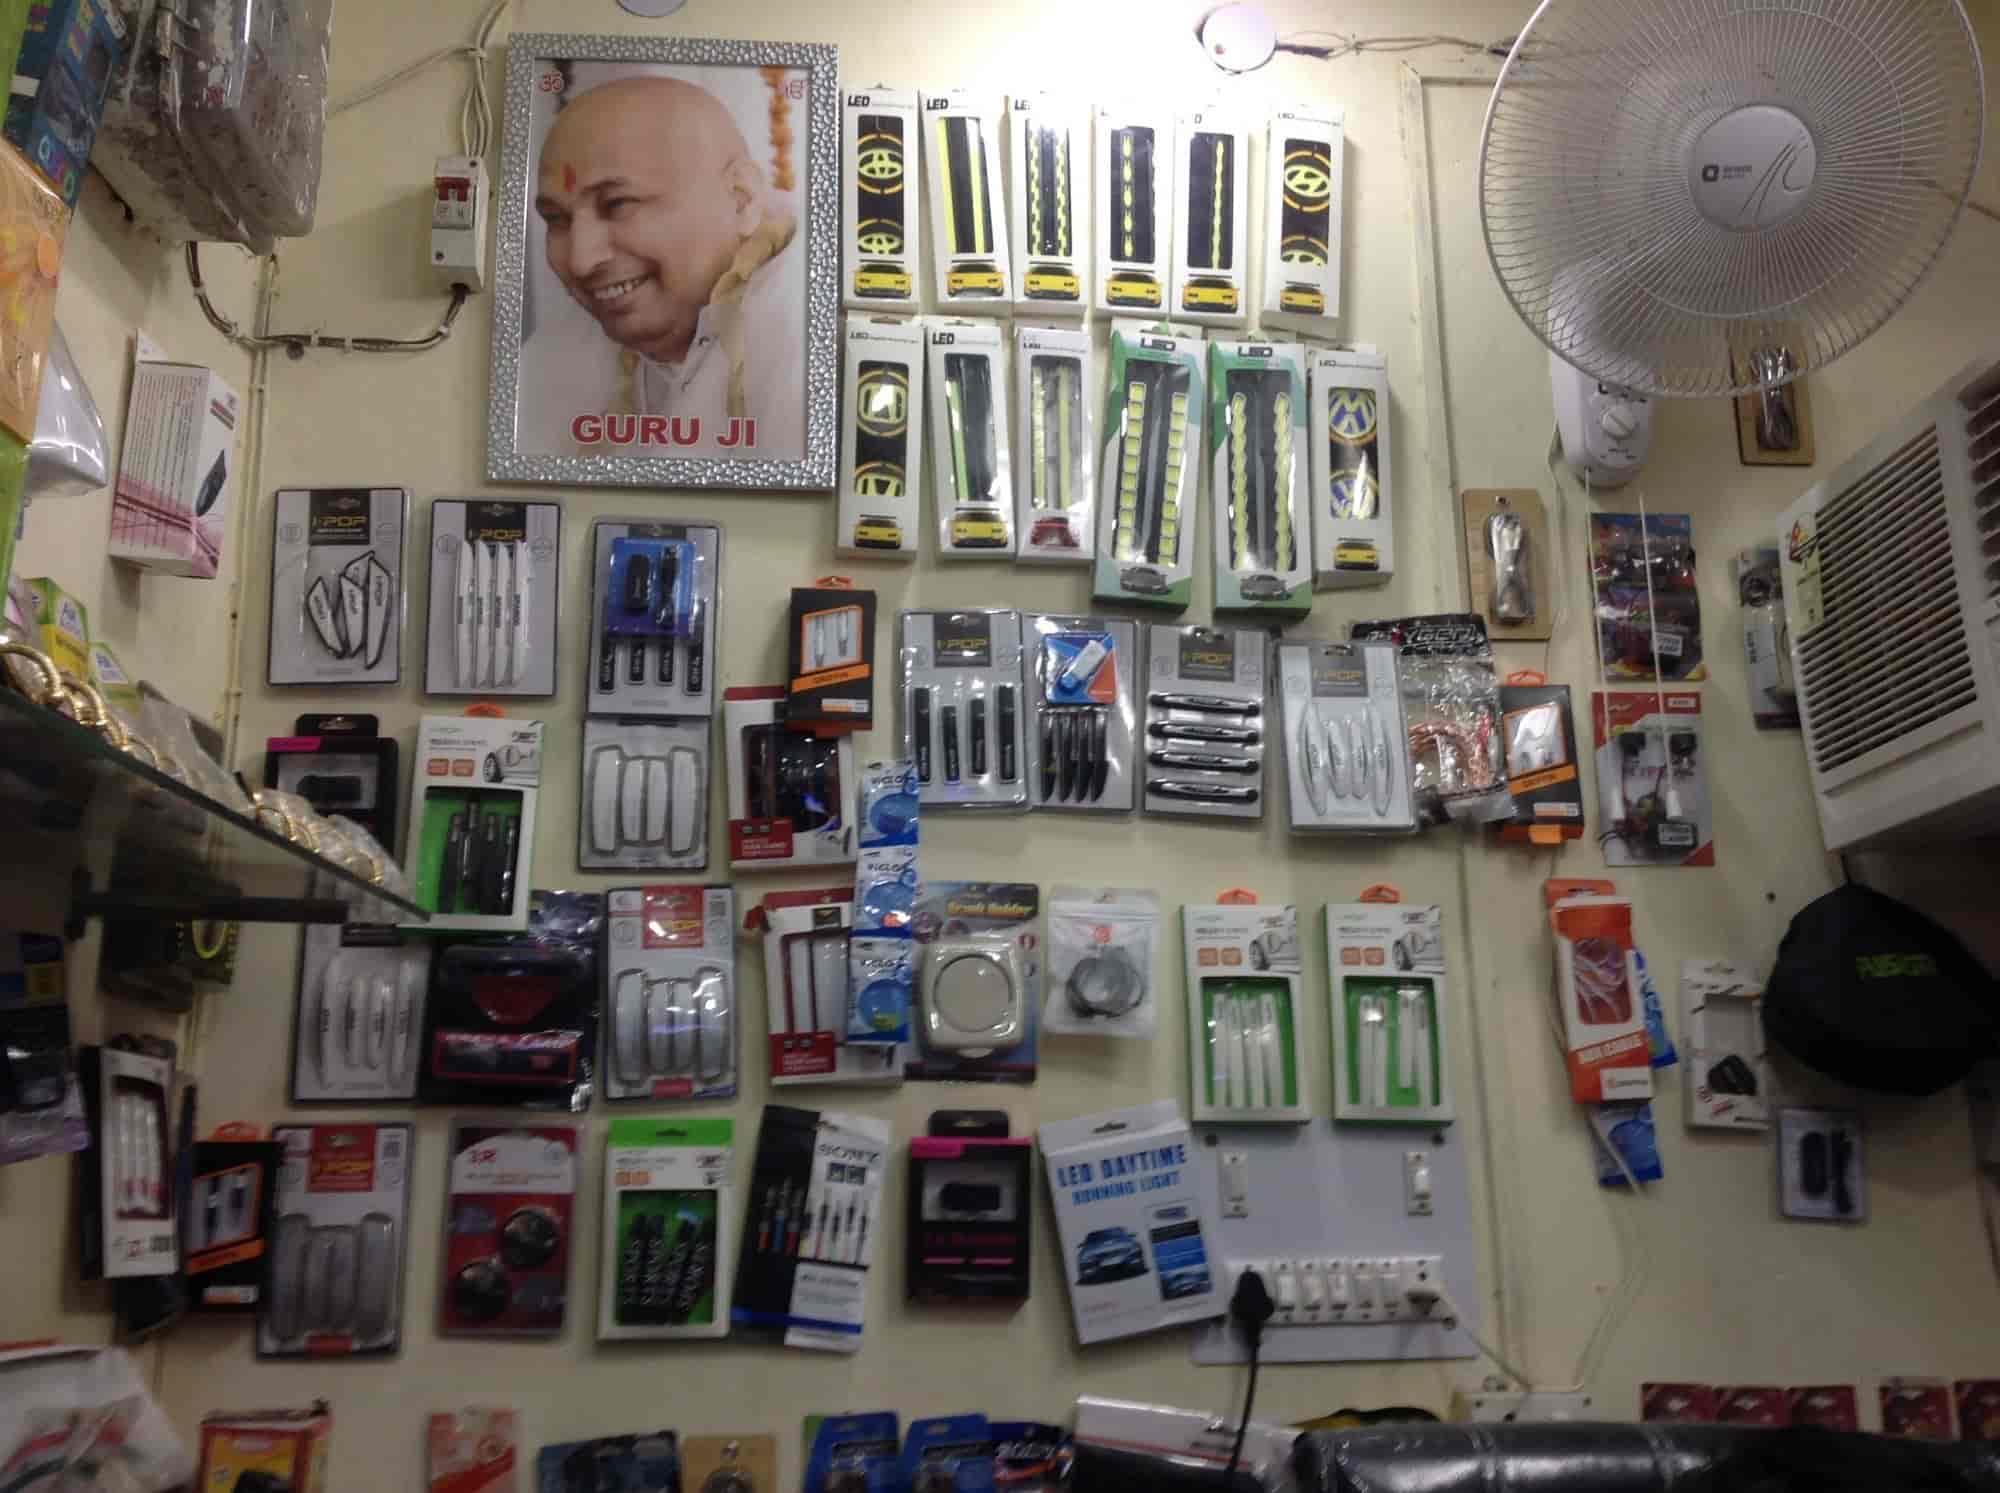 New A To Z Car Accessories Photos, Moti Nagar, Delhi- Pictures